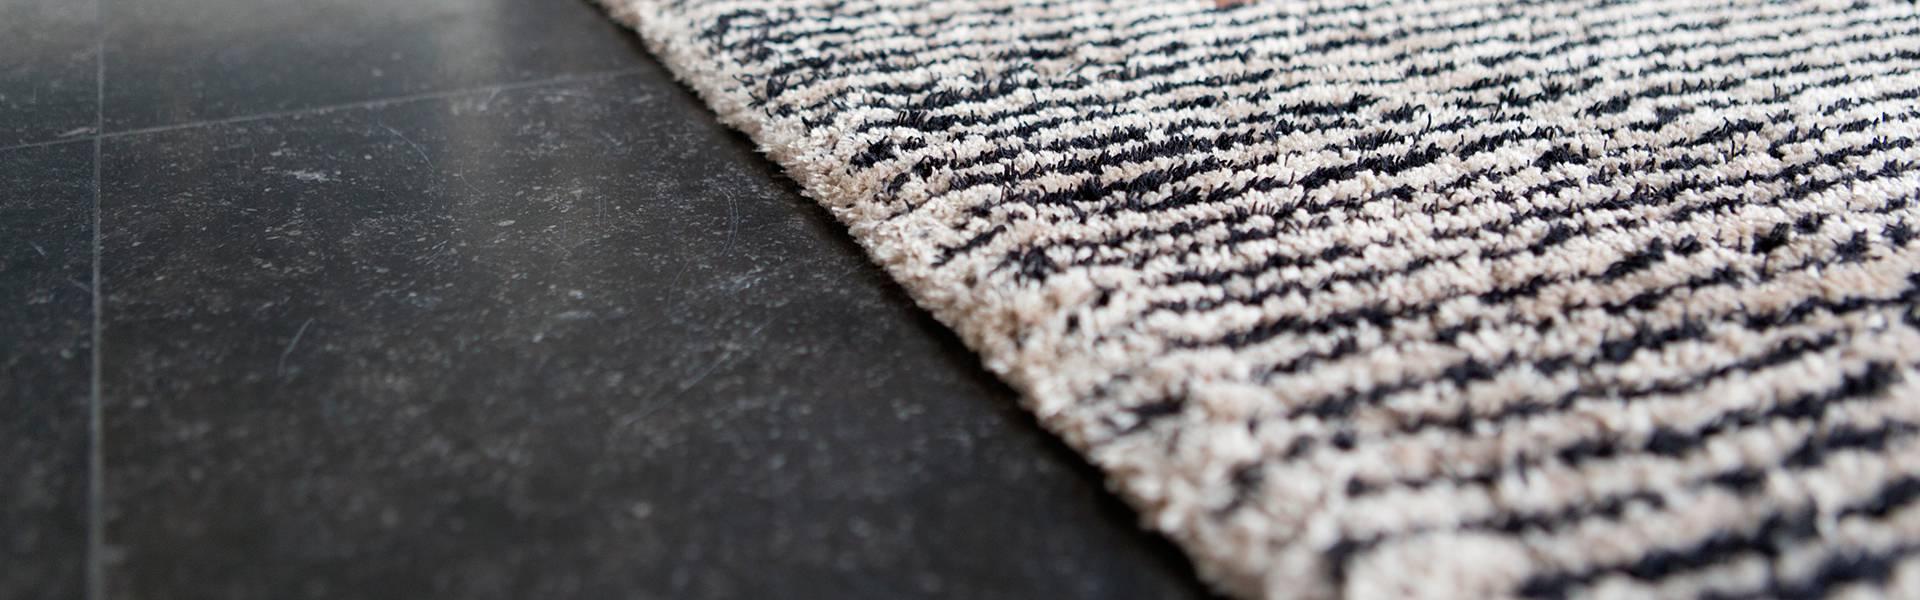 claire-tondeleir-tapijt